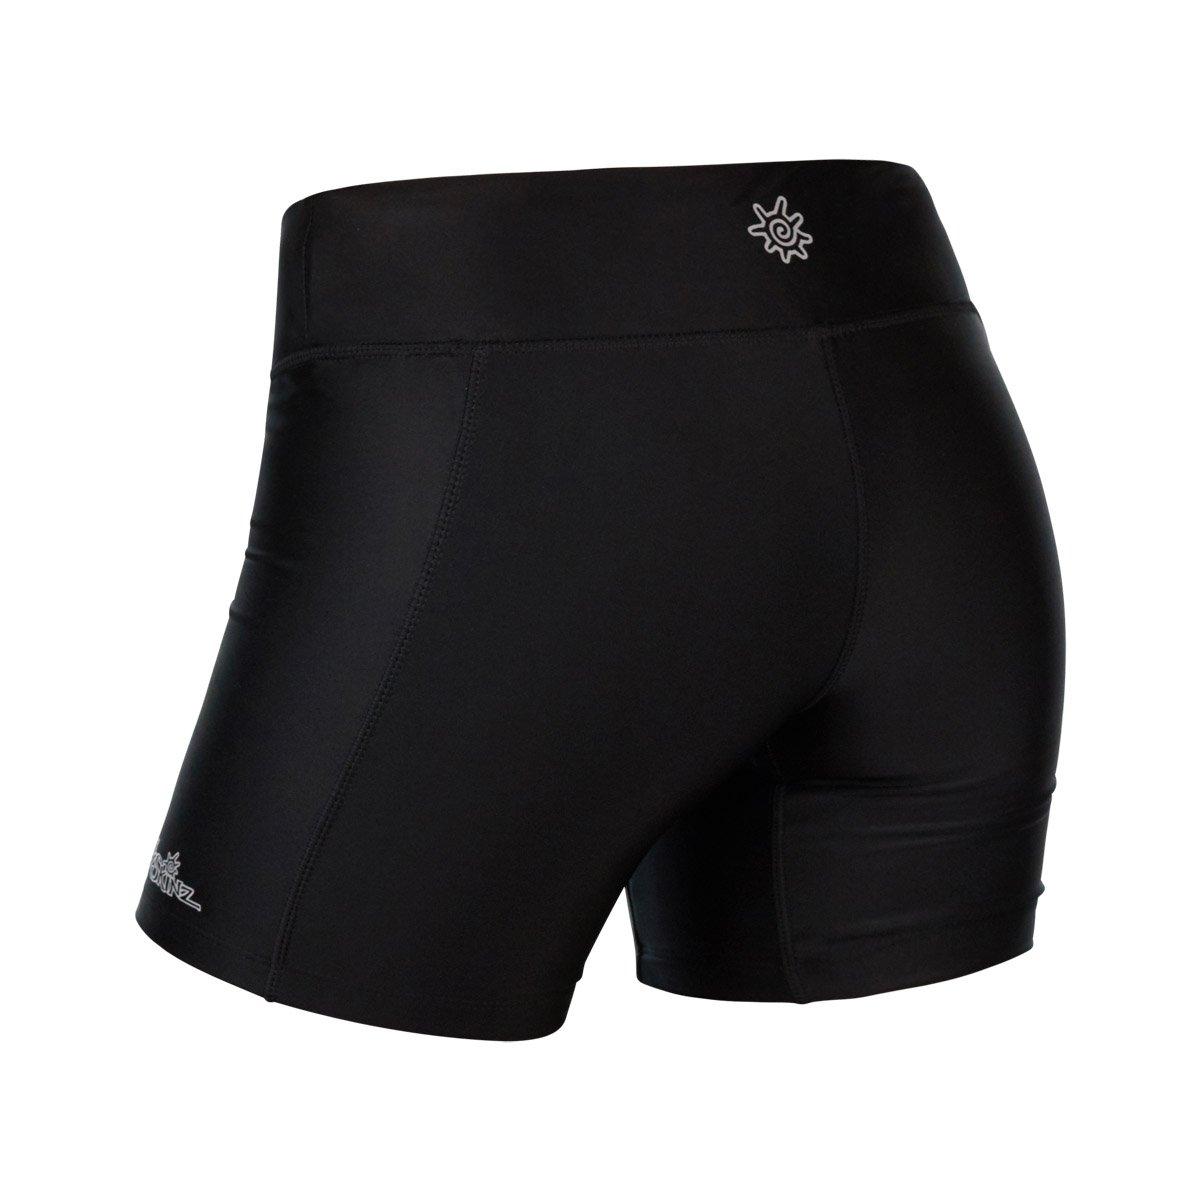 34e3728ded Amazon.com: UV Skinz UPF 50+ Women's Active Swim Shorts: Clothing